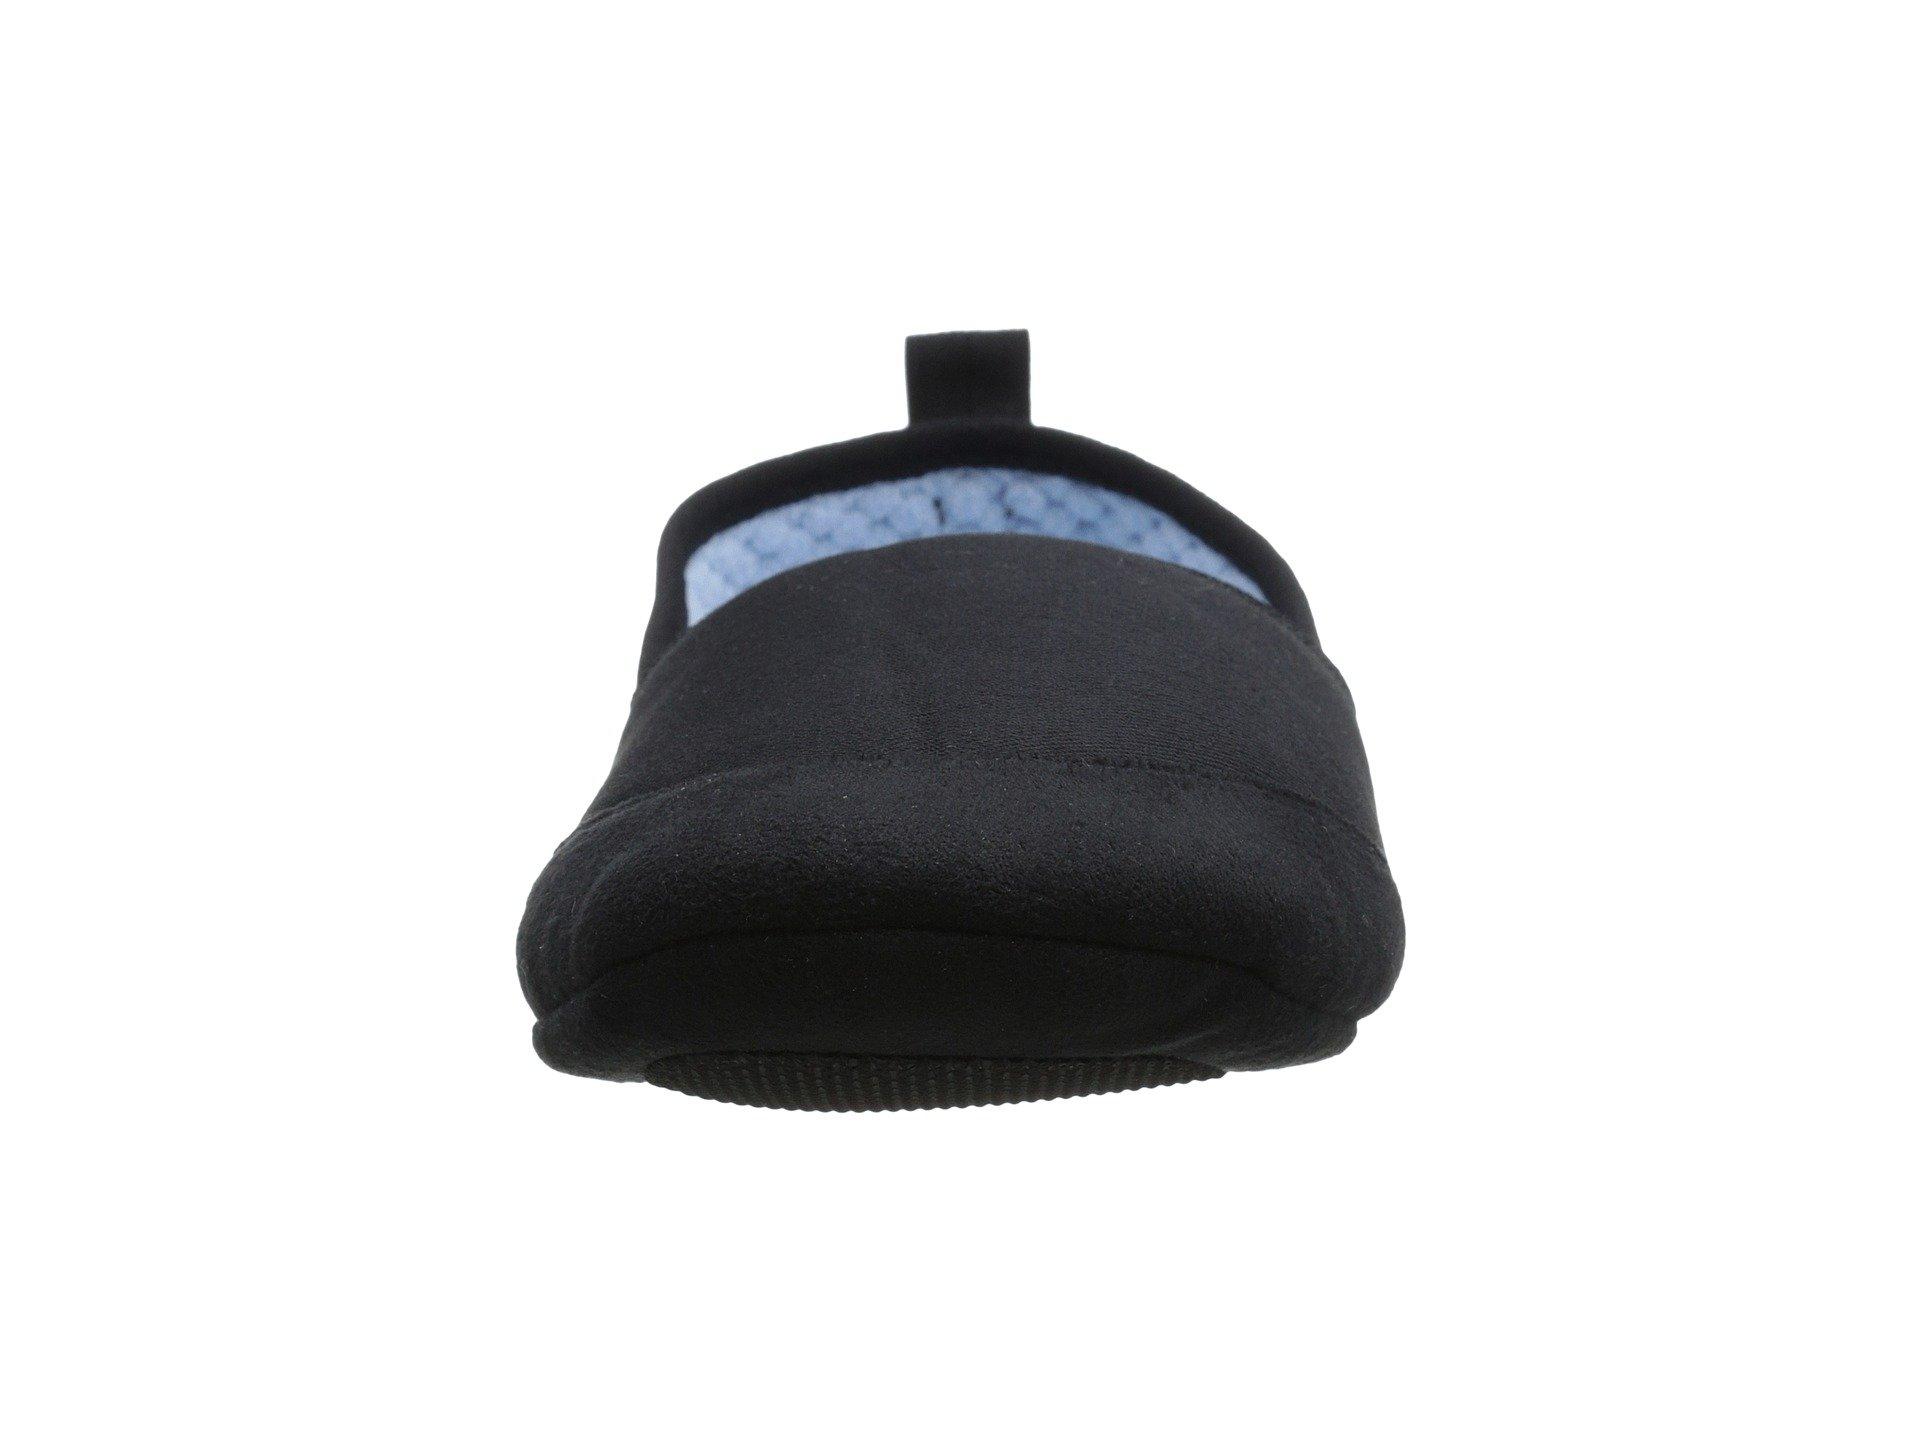 Travel Pack Go Black Pouch Moc amp; W Acorn q86X7x7